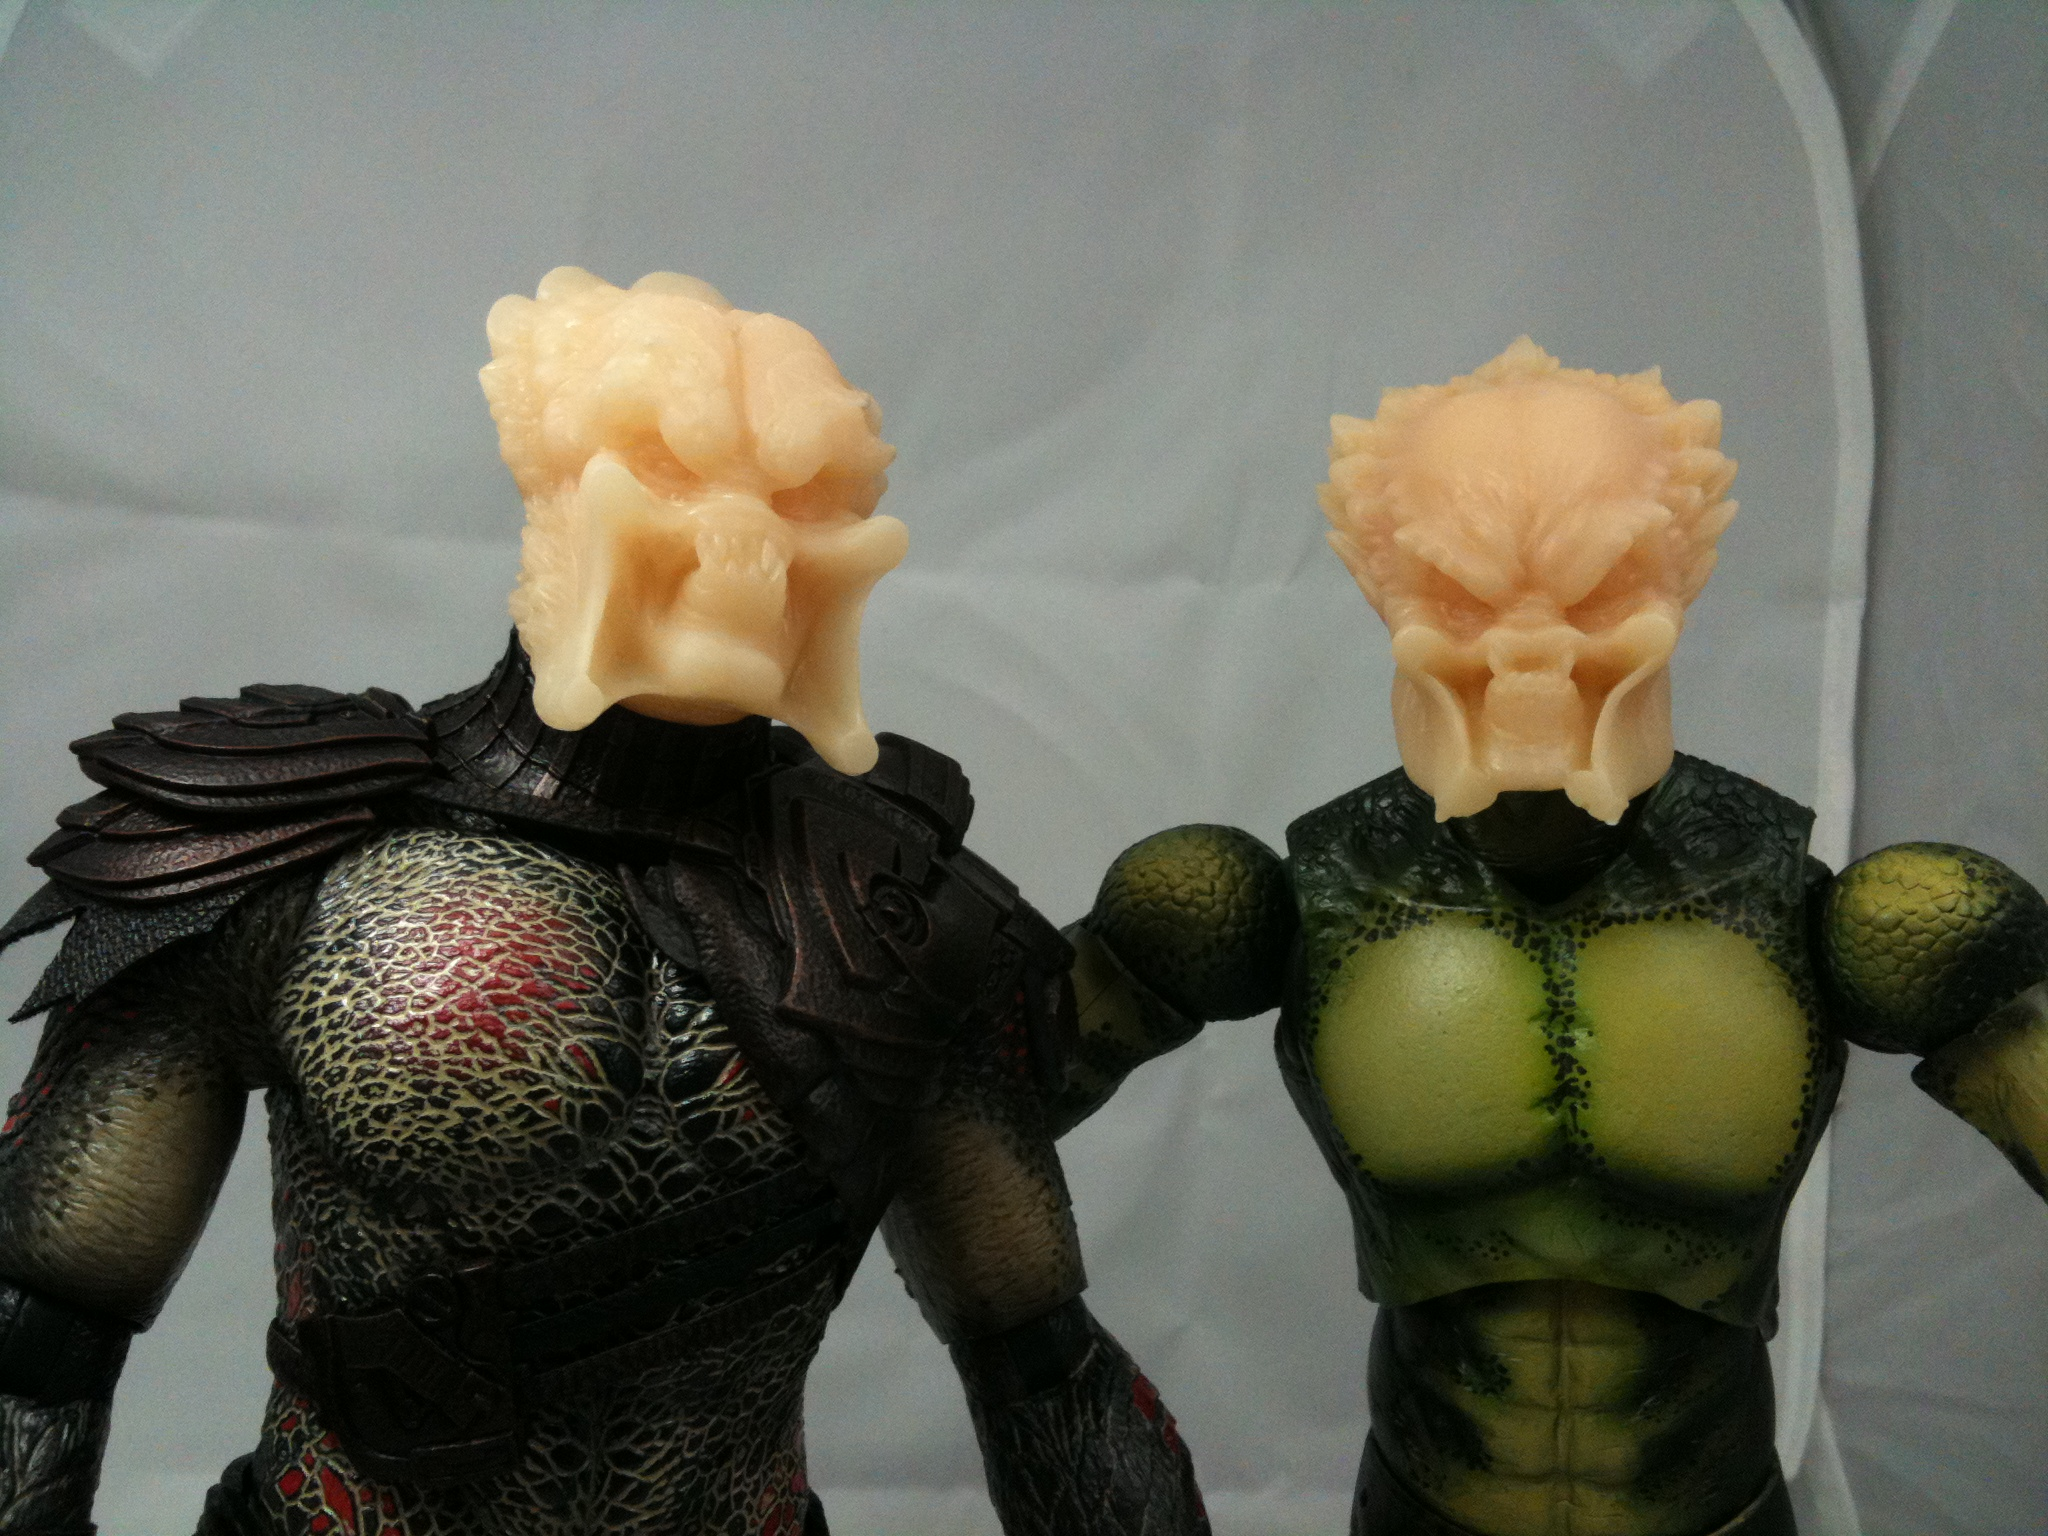 1_6_Custom_Predator_Heads_on_Hot_Toy_Bodies.JPG